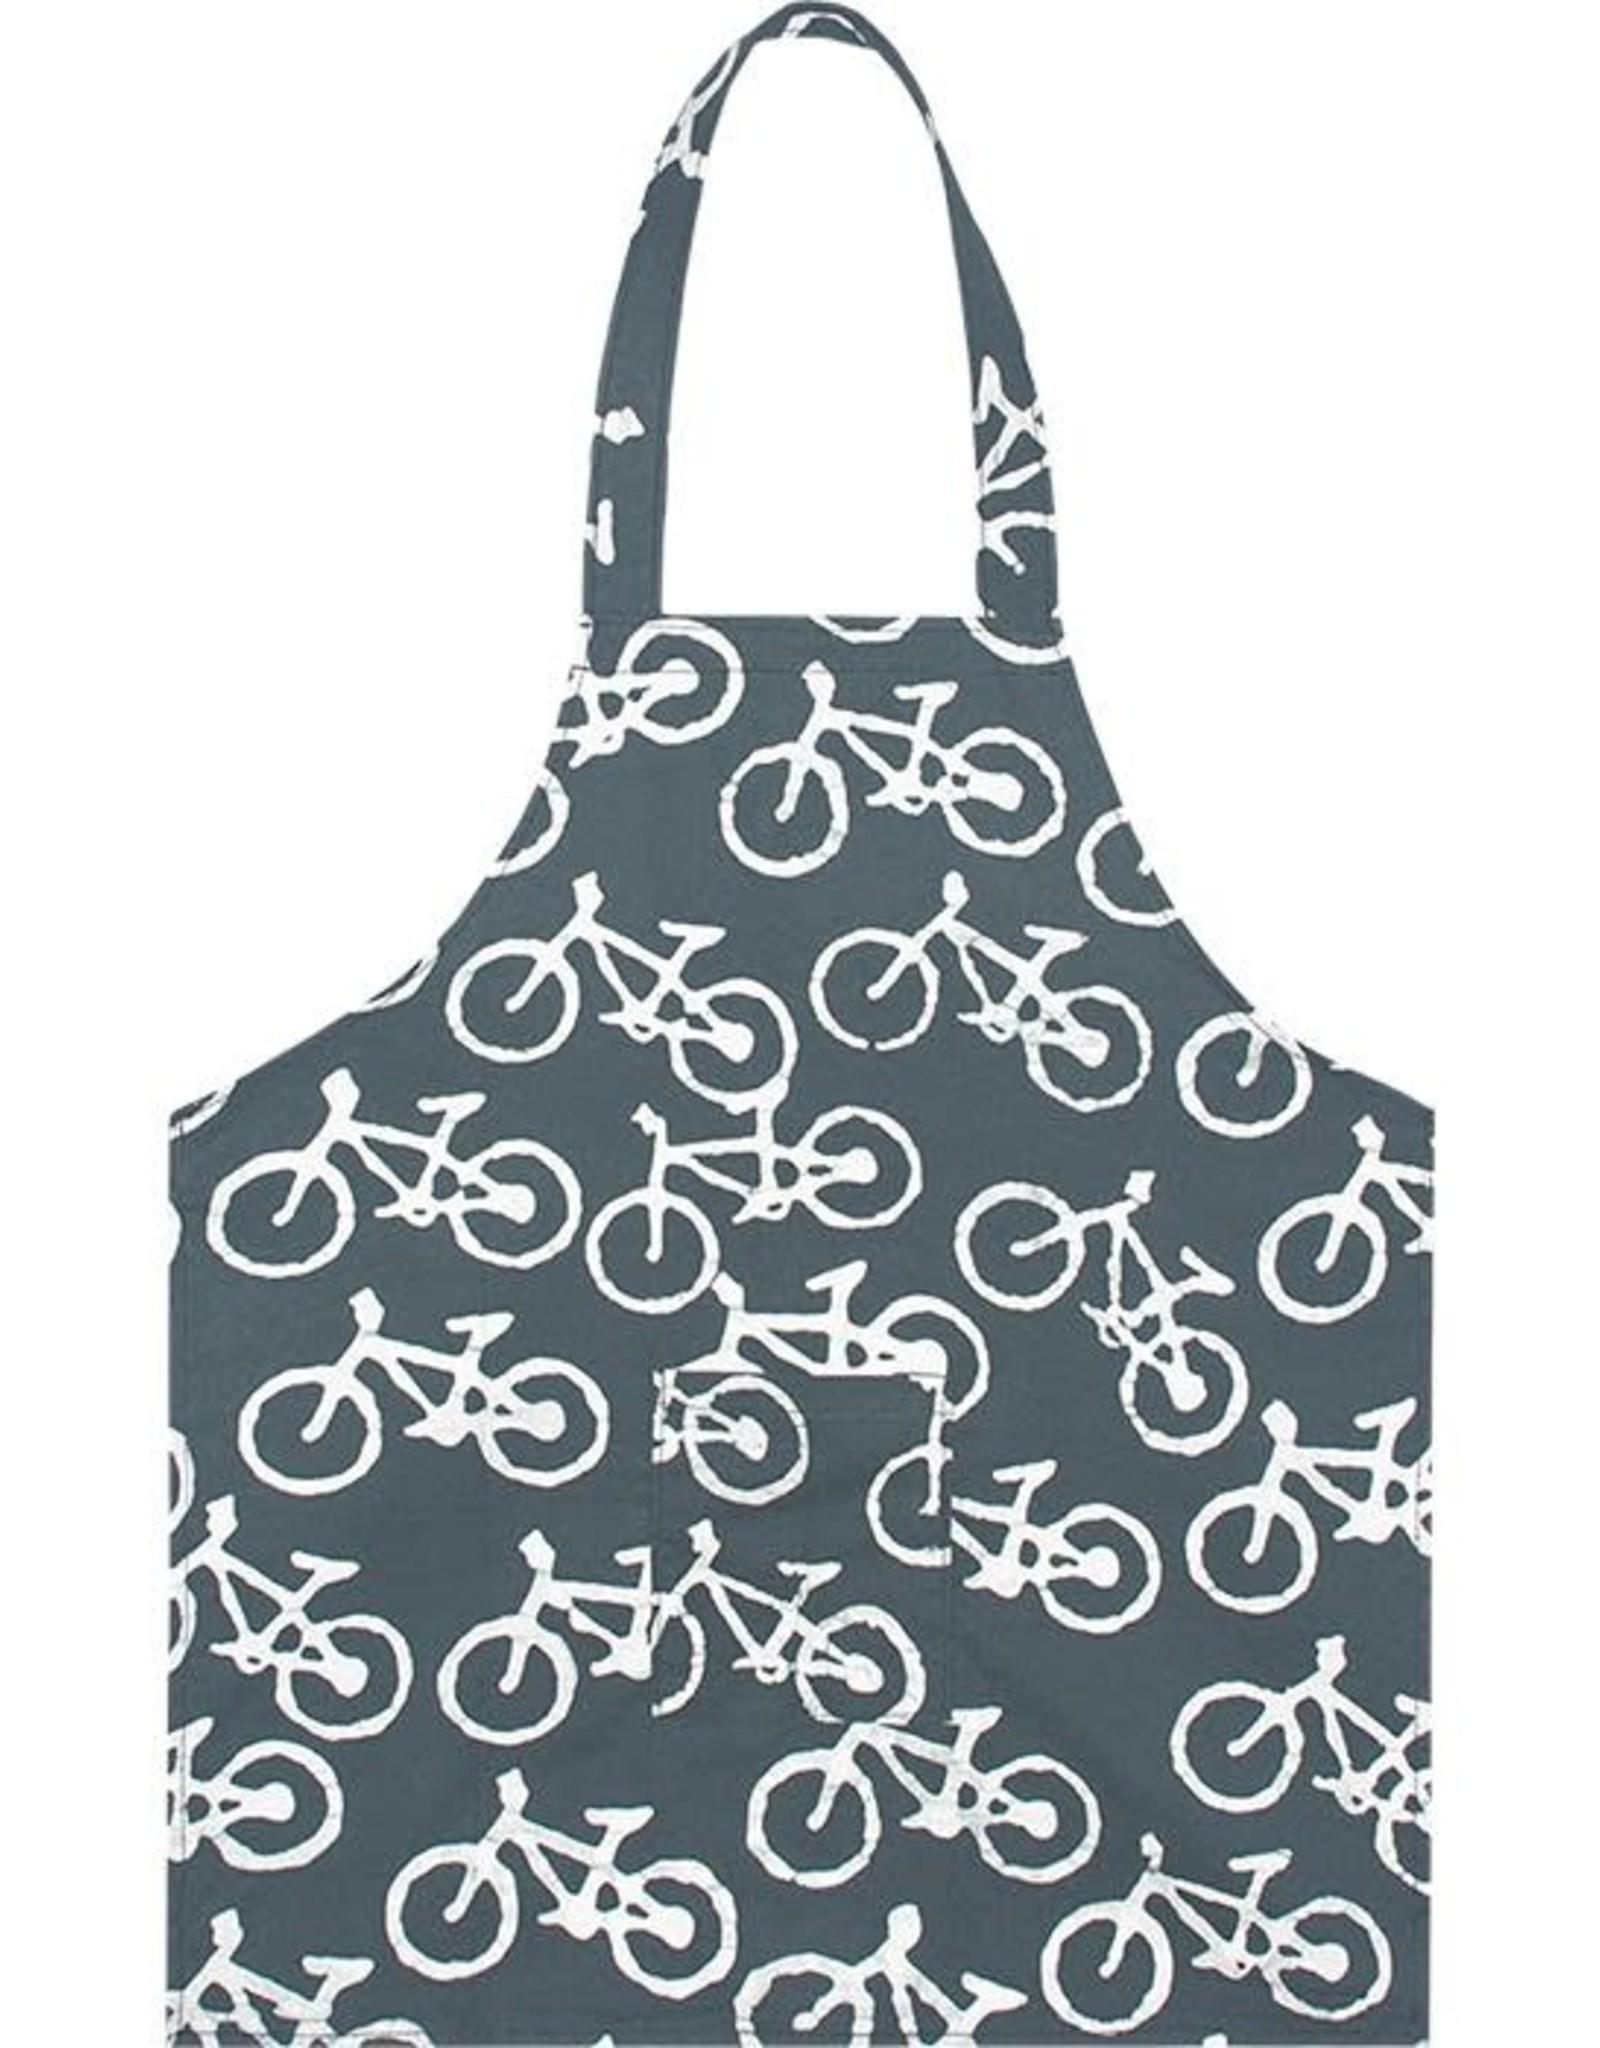 Global Mamas Apron Kids Bikes Charcoal